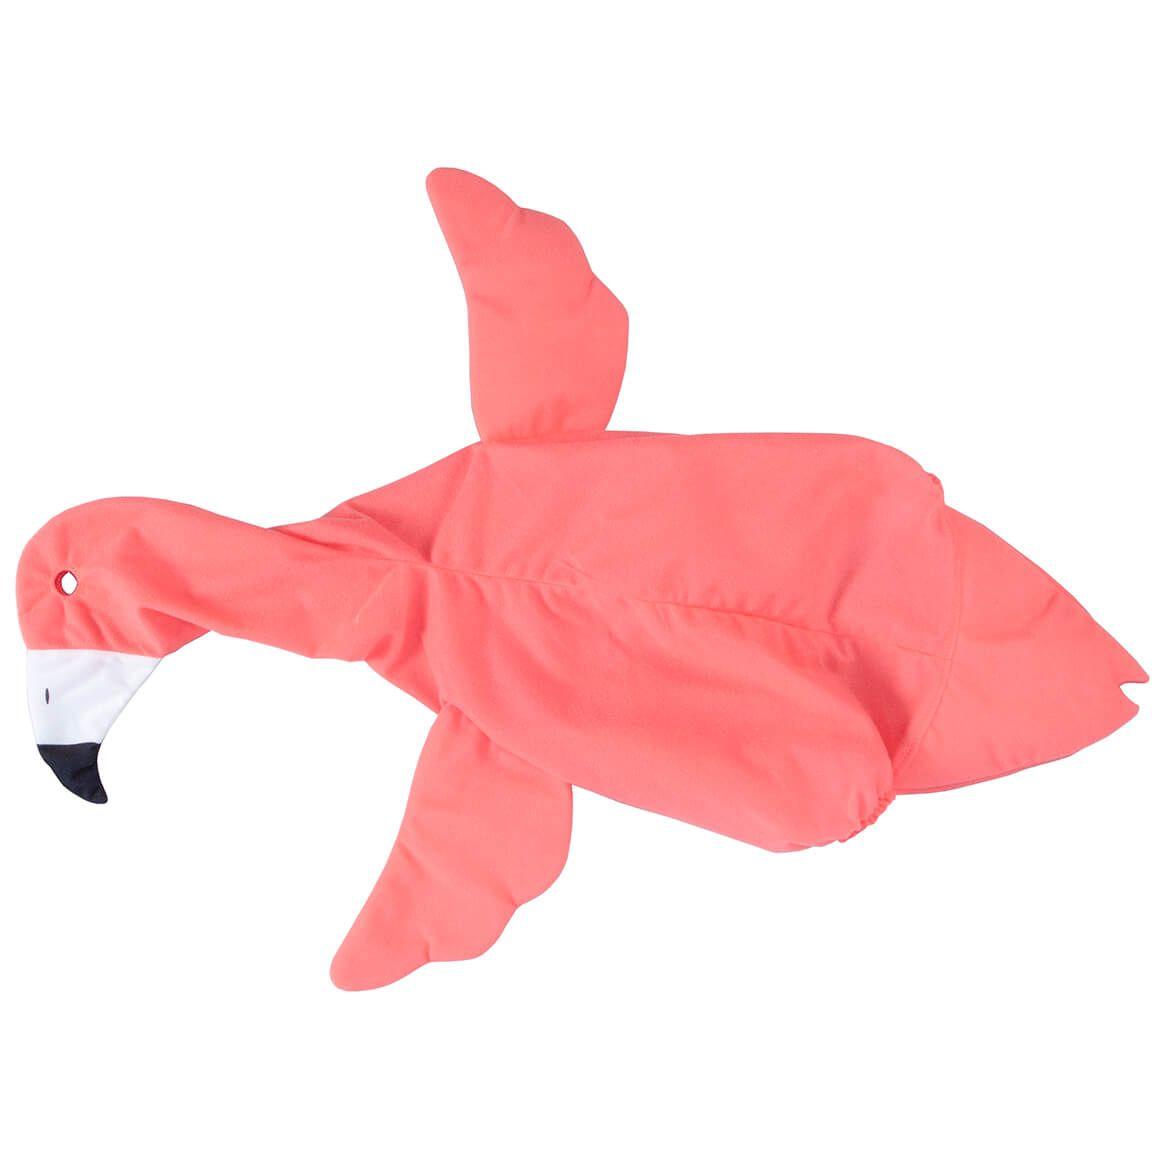 Flamingo Goose Outfit-354694